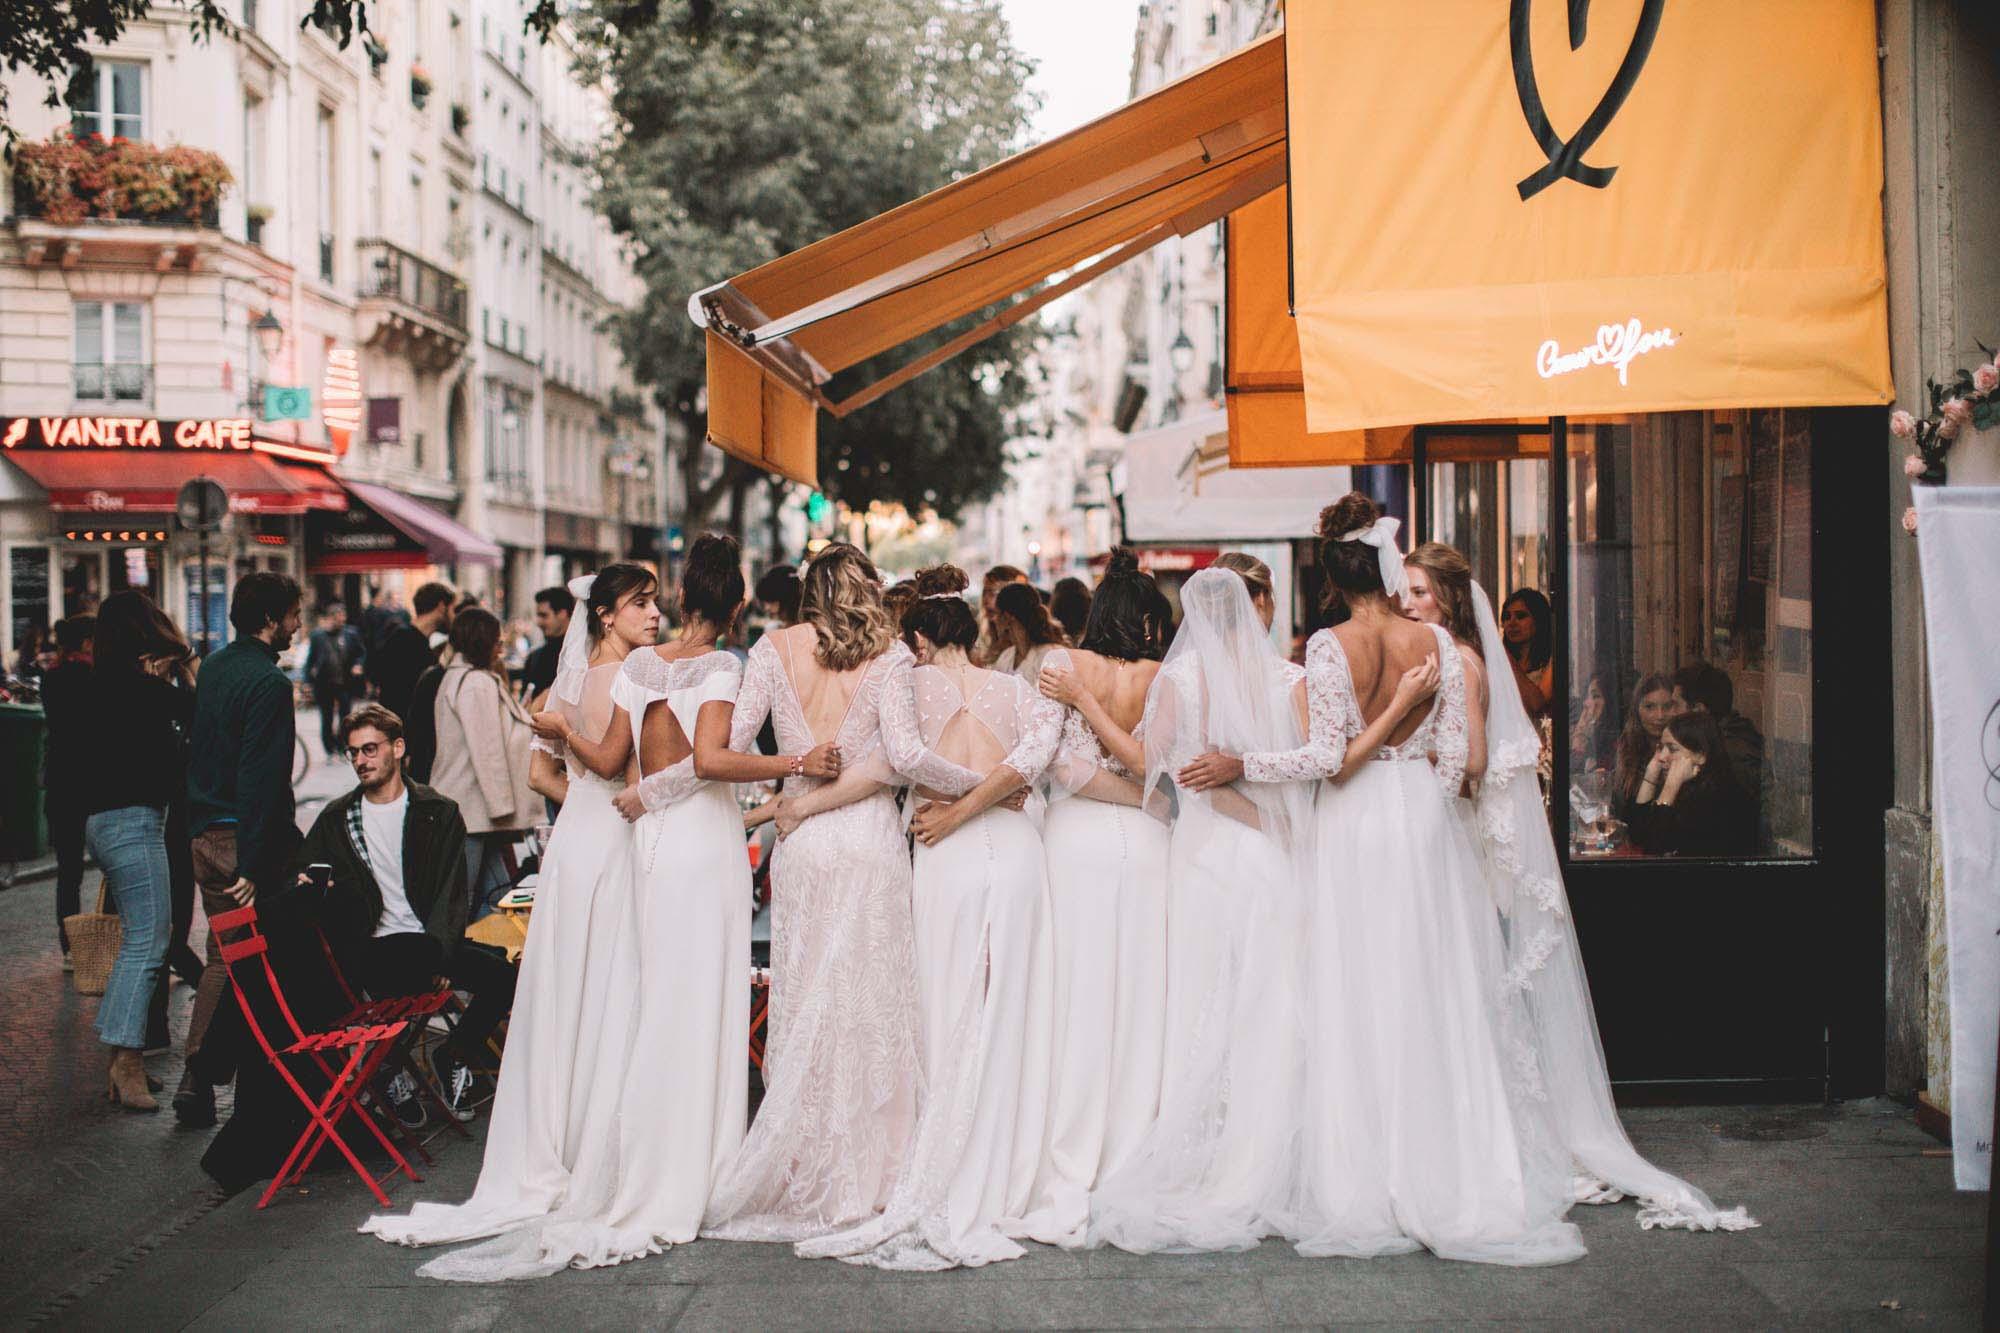 JEANNE SOURCE_DEFILE_COEUR SAUVAGE_PHOTOGRAPHE_MARIAGE_LES BANDITS-7